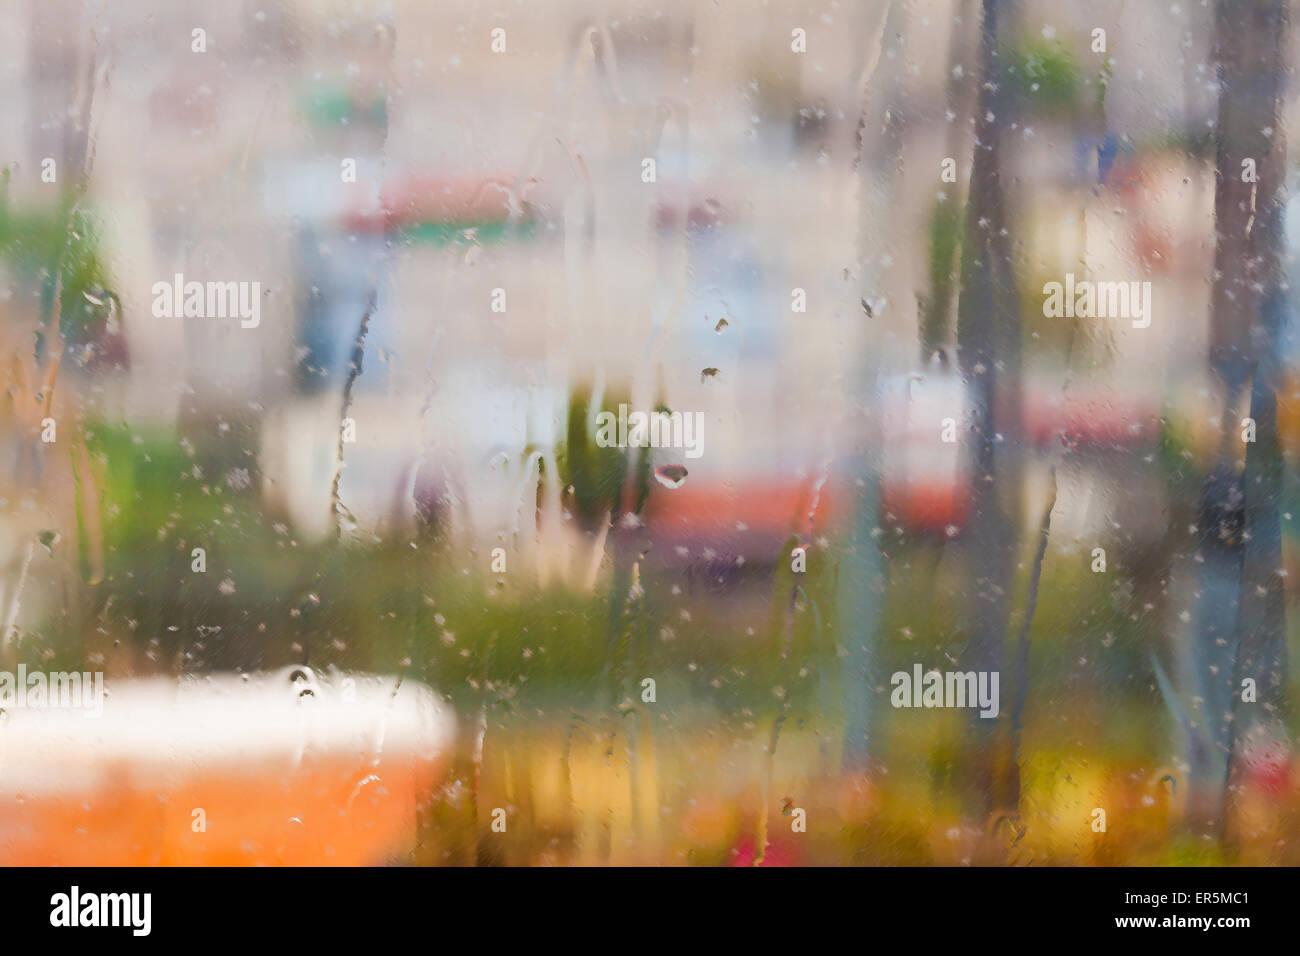 Resumen fondo de textura de ventana lluviosa frente a un paisaje ...